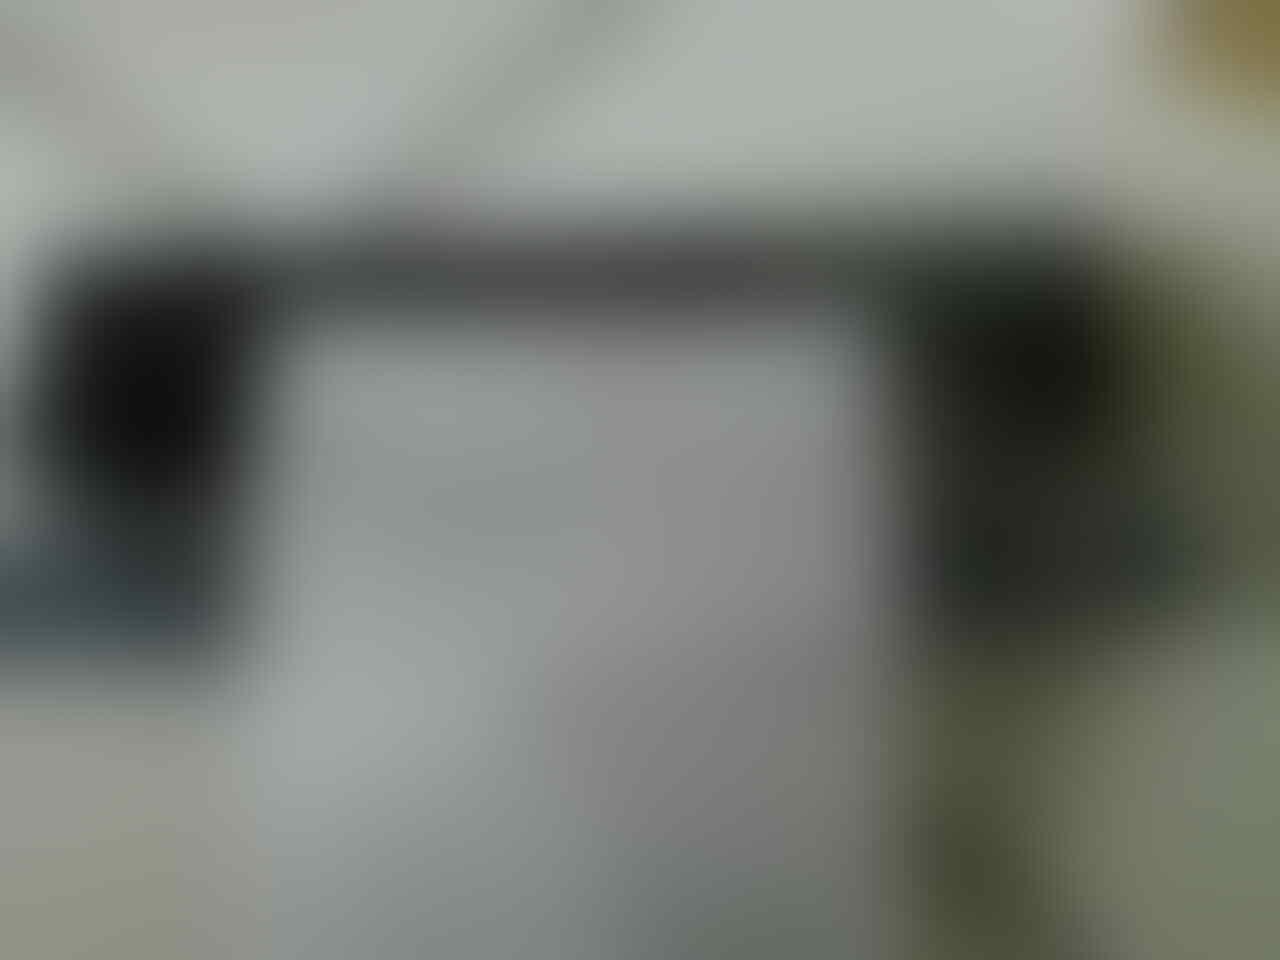 Baterai laptop ORI & OEM ACER/ASUS/AXIOO/BENQ/DELL/HP/COMPAQ/LENOVO/SONY/TOSHIBA